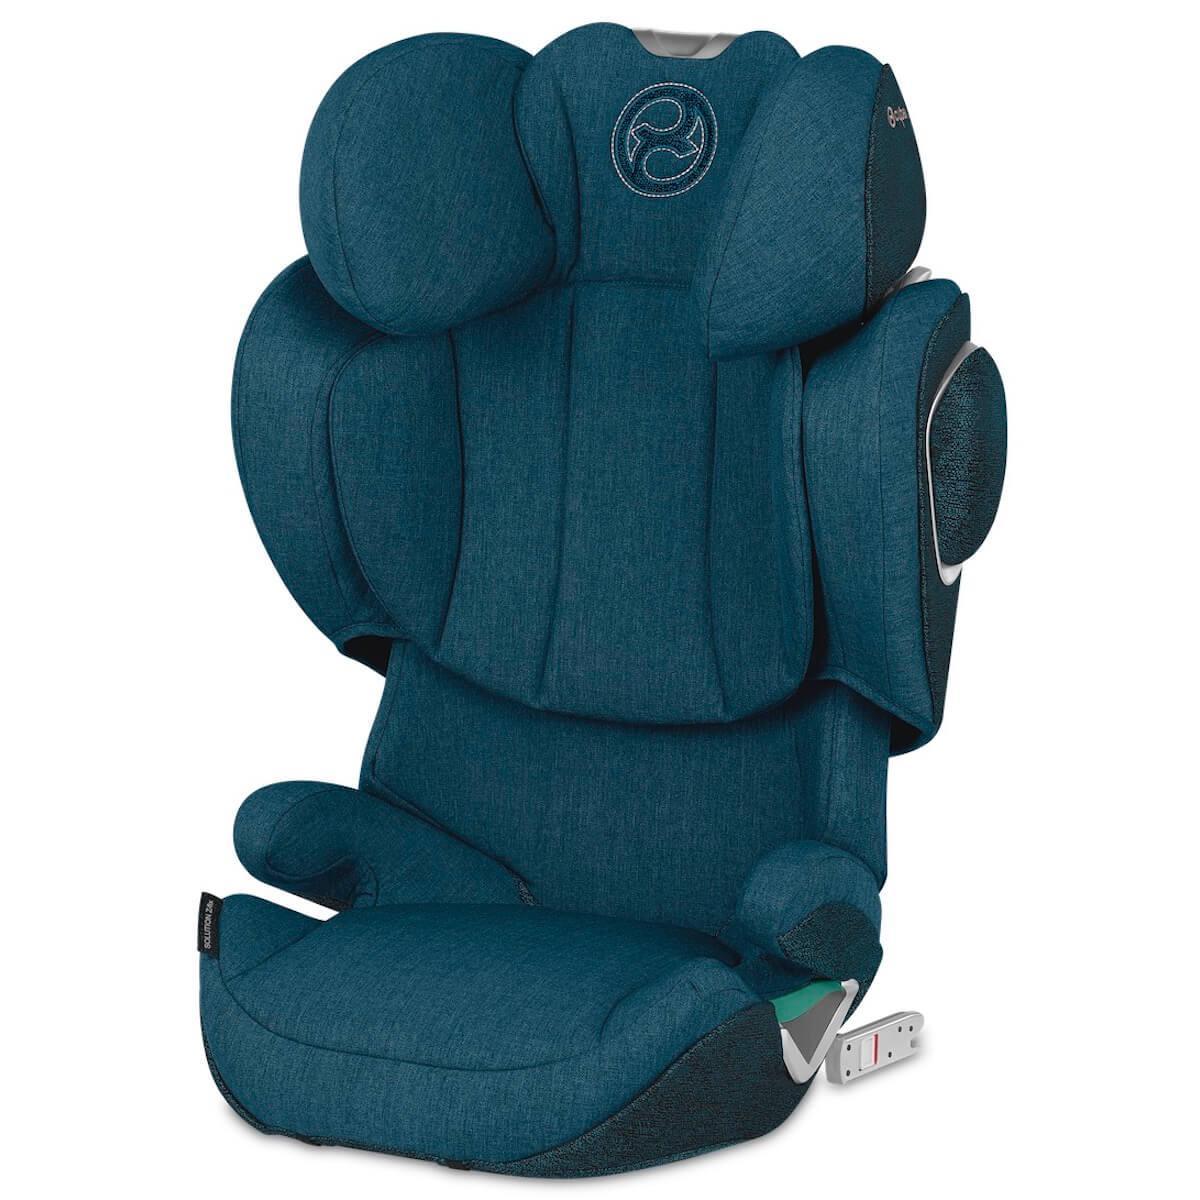 Siège auto gr2/3 SOLUTION Z I-FIX PLUS Cybex Mountain blue-turquoise